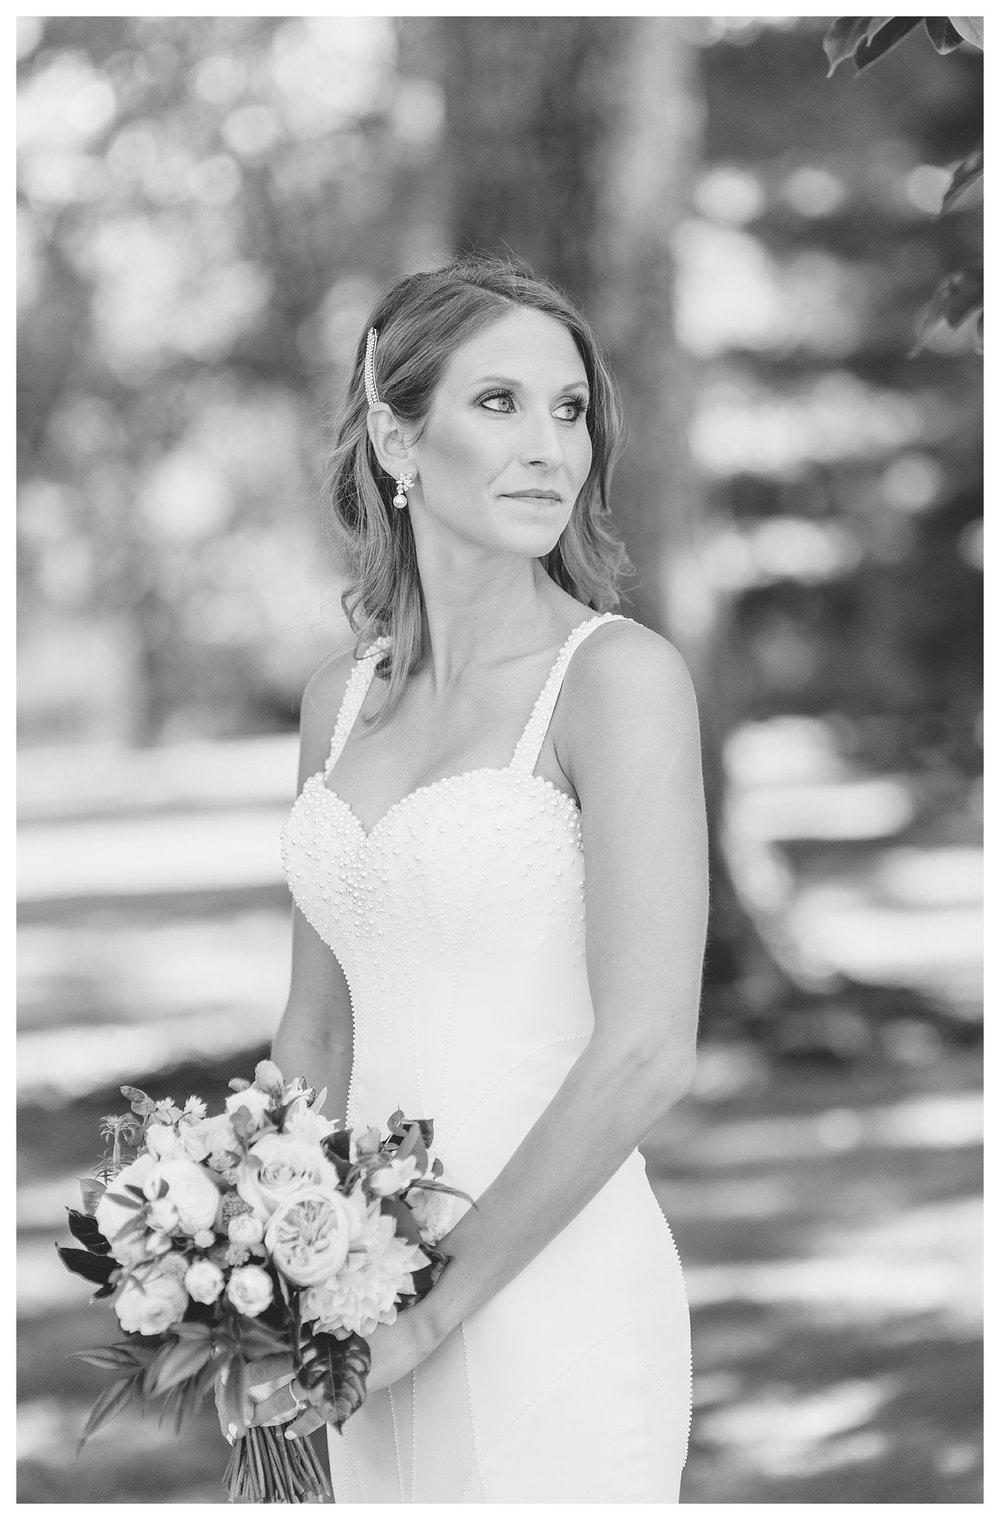 everleighphotography-cincinnati-wedding-photographer-northern-kentucky-wedding-photographer-camargo-country-club-the-karsh-wedding-17